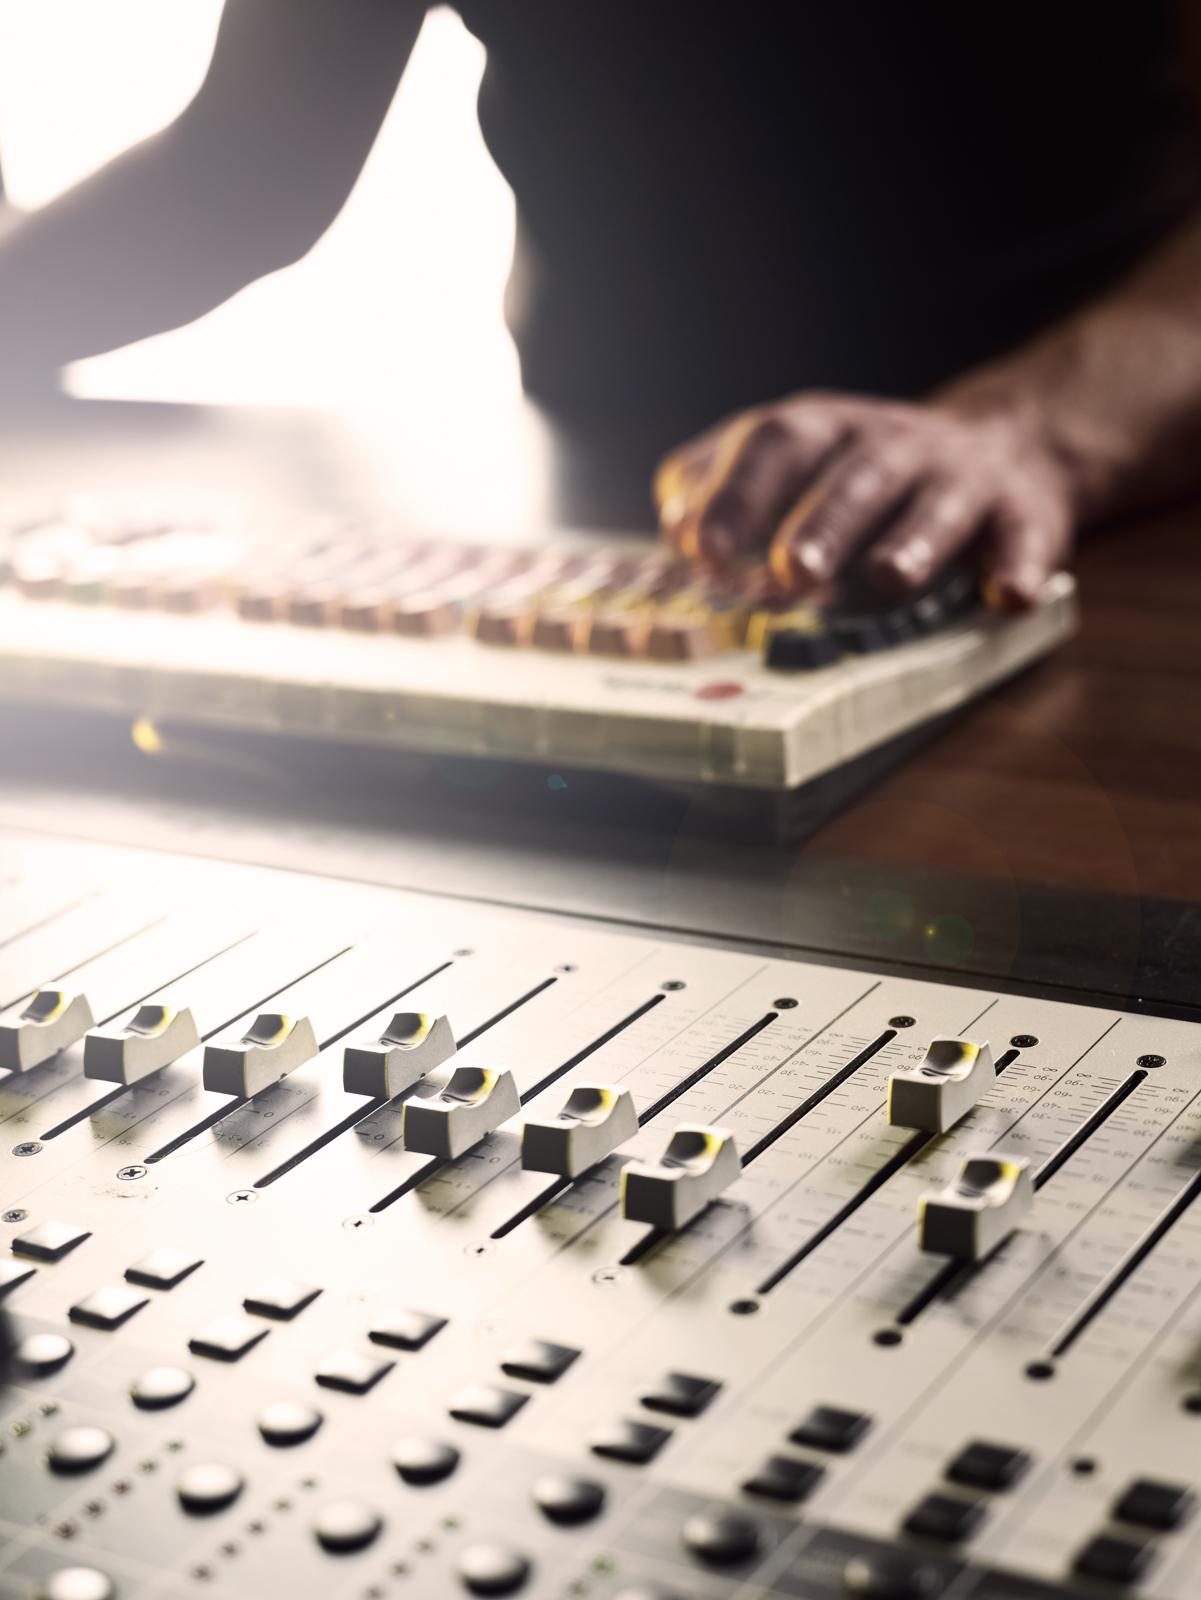 soundmill_005.jpg